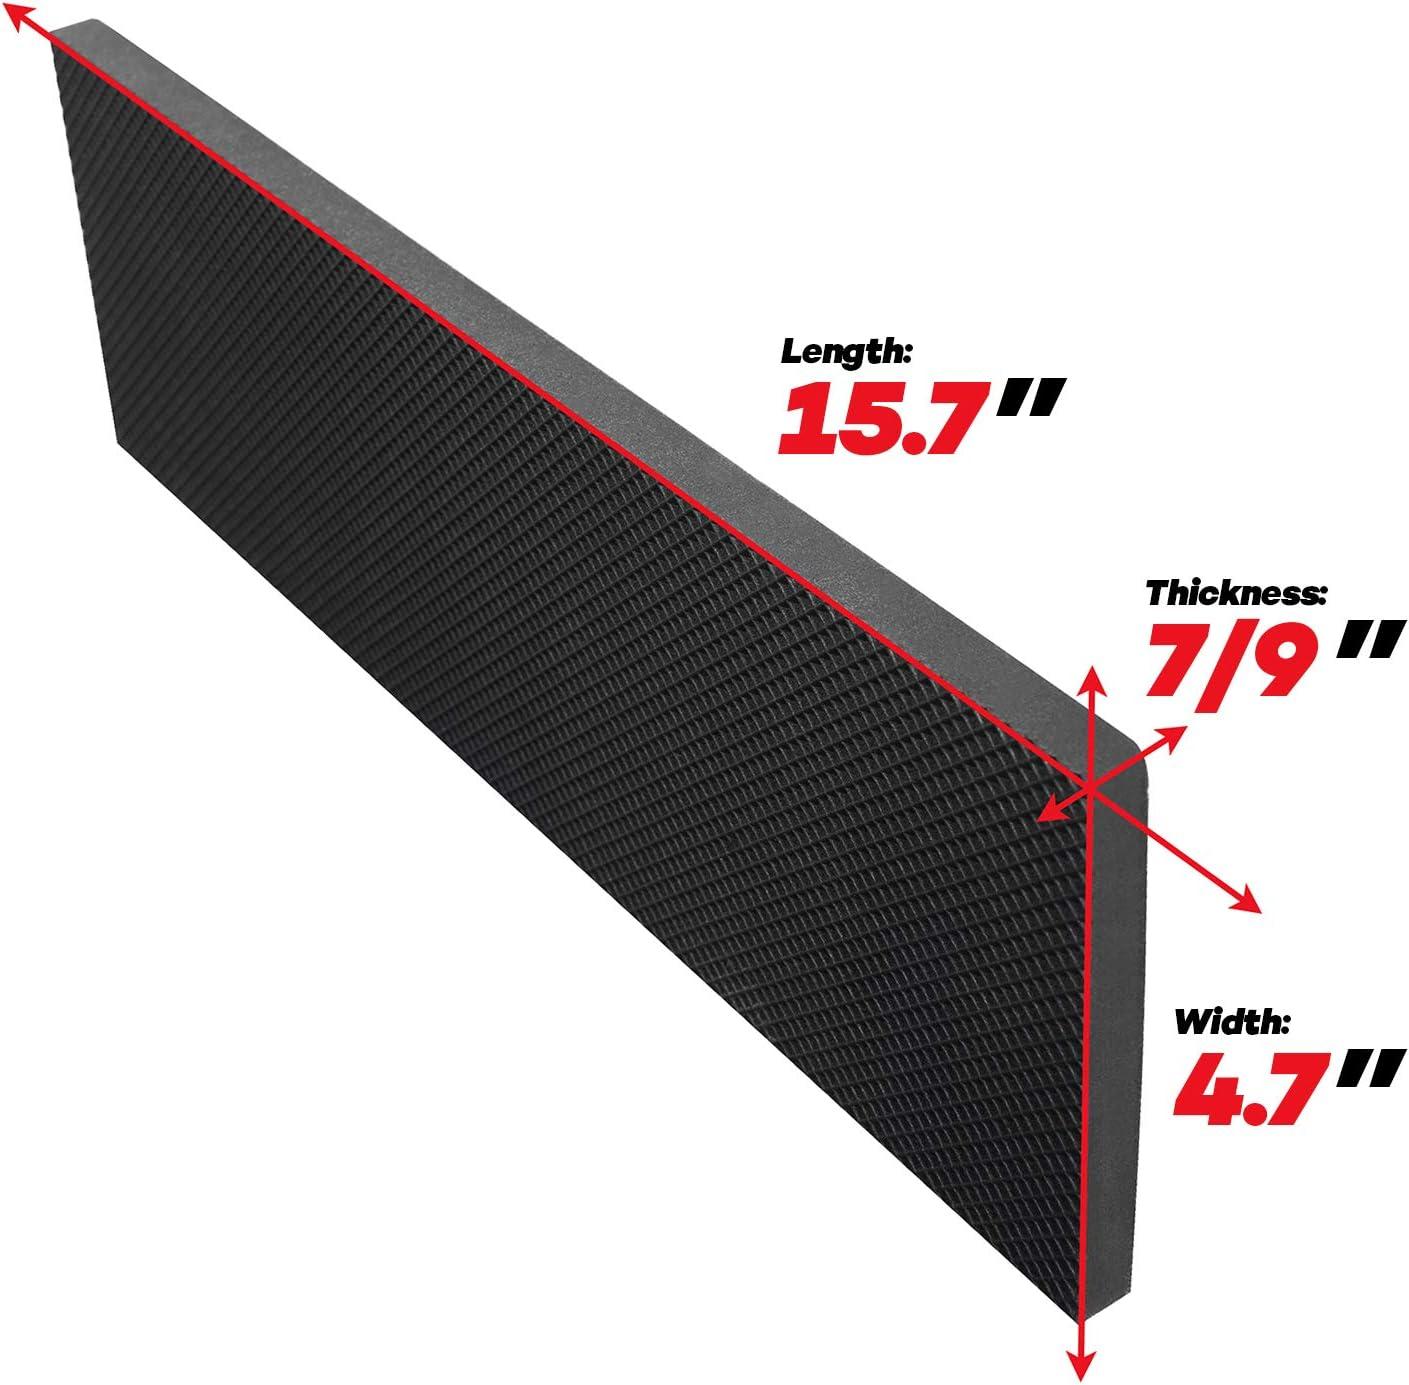 Car Door /& Bumper Guards 15.7 x 4.7 7//9 Thick 5X Garage Wall Protectors Self Adhesive Foam Wall Padding